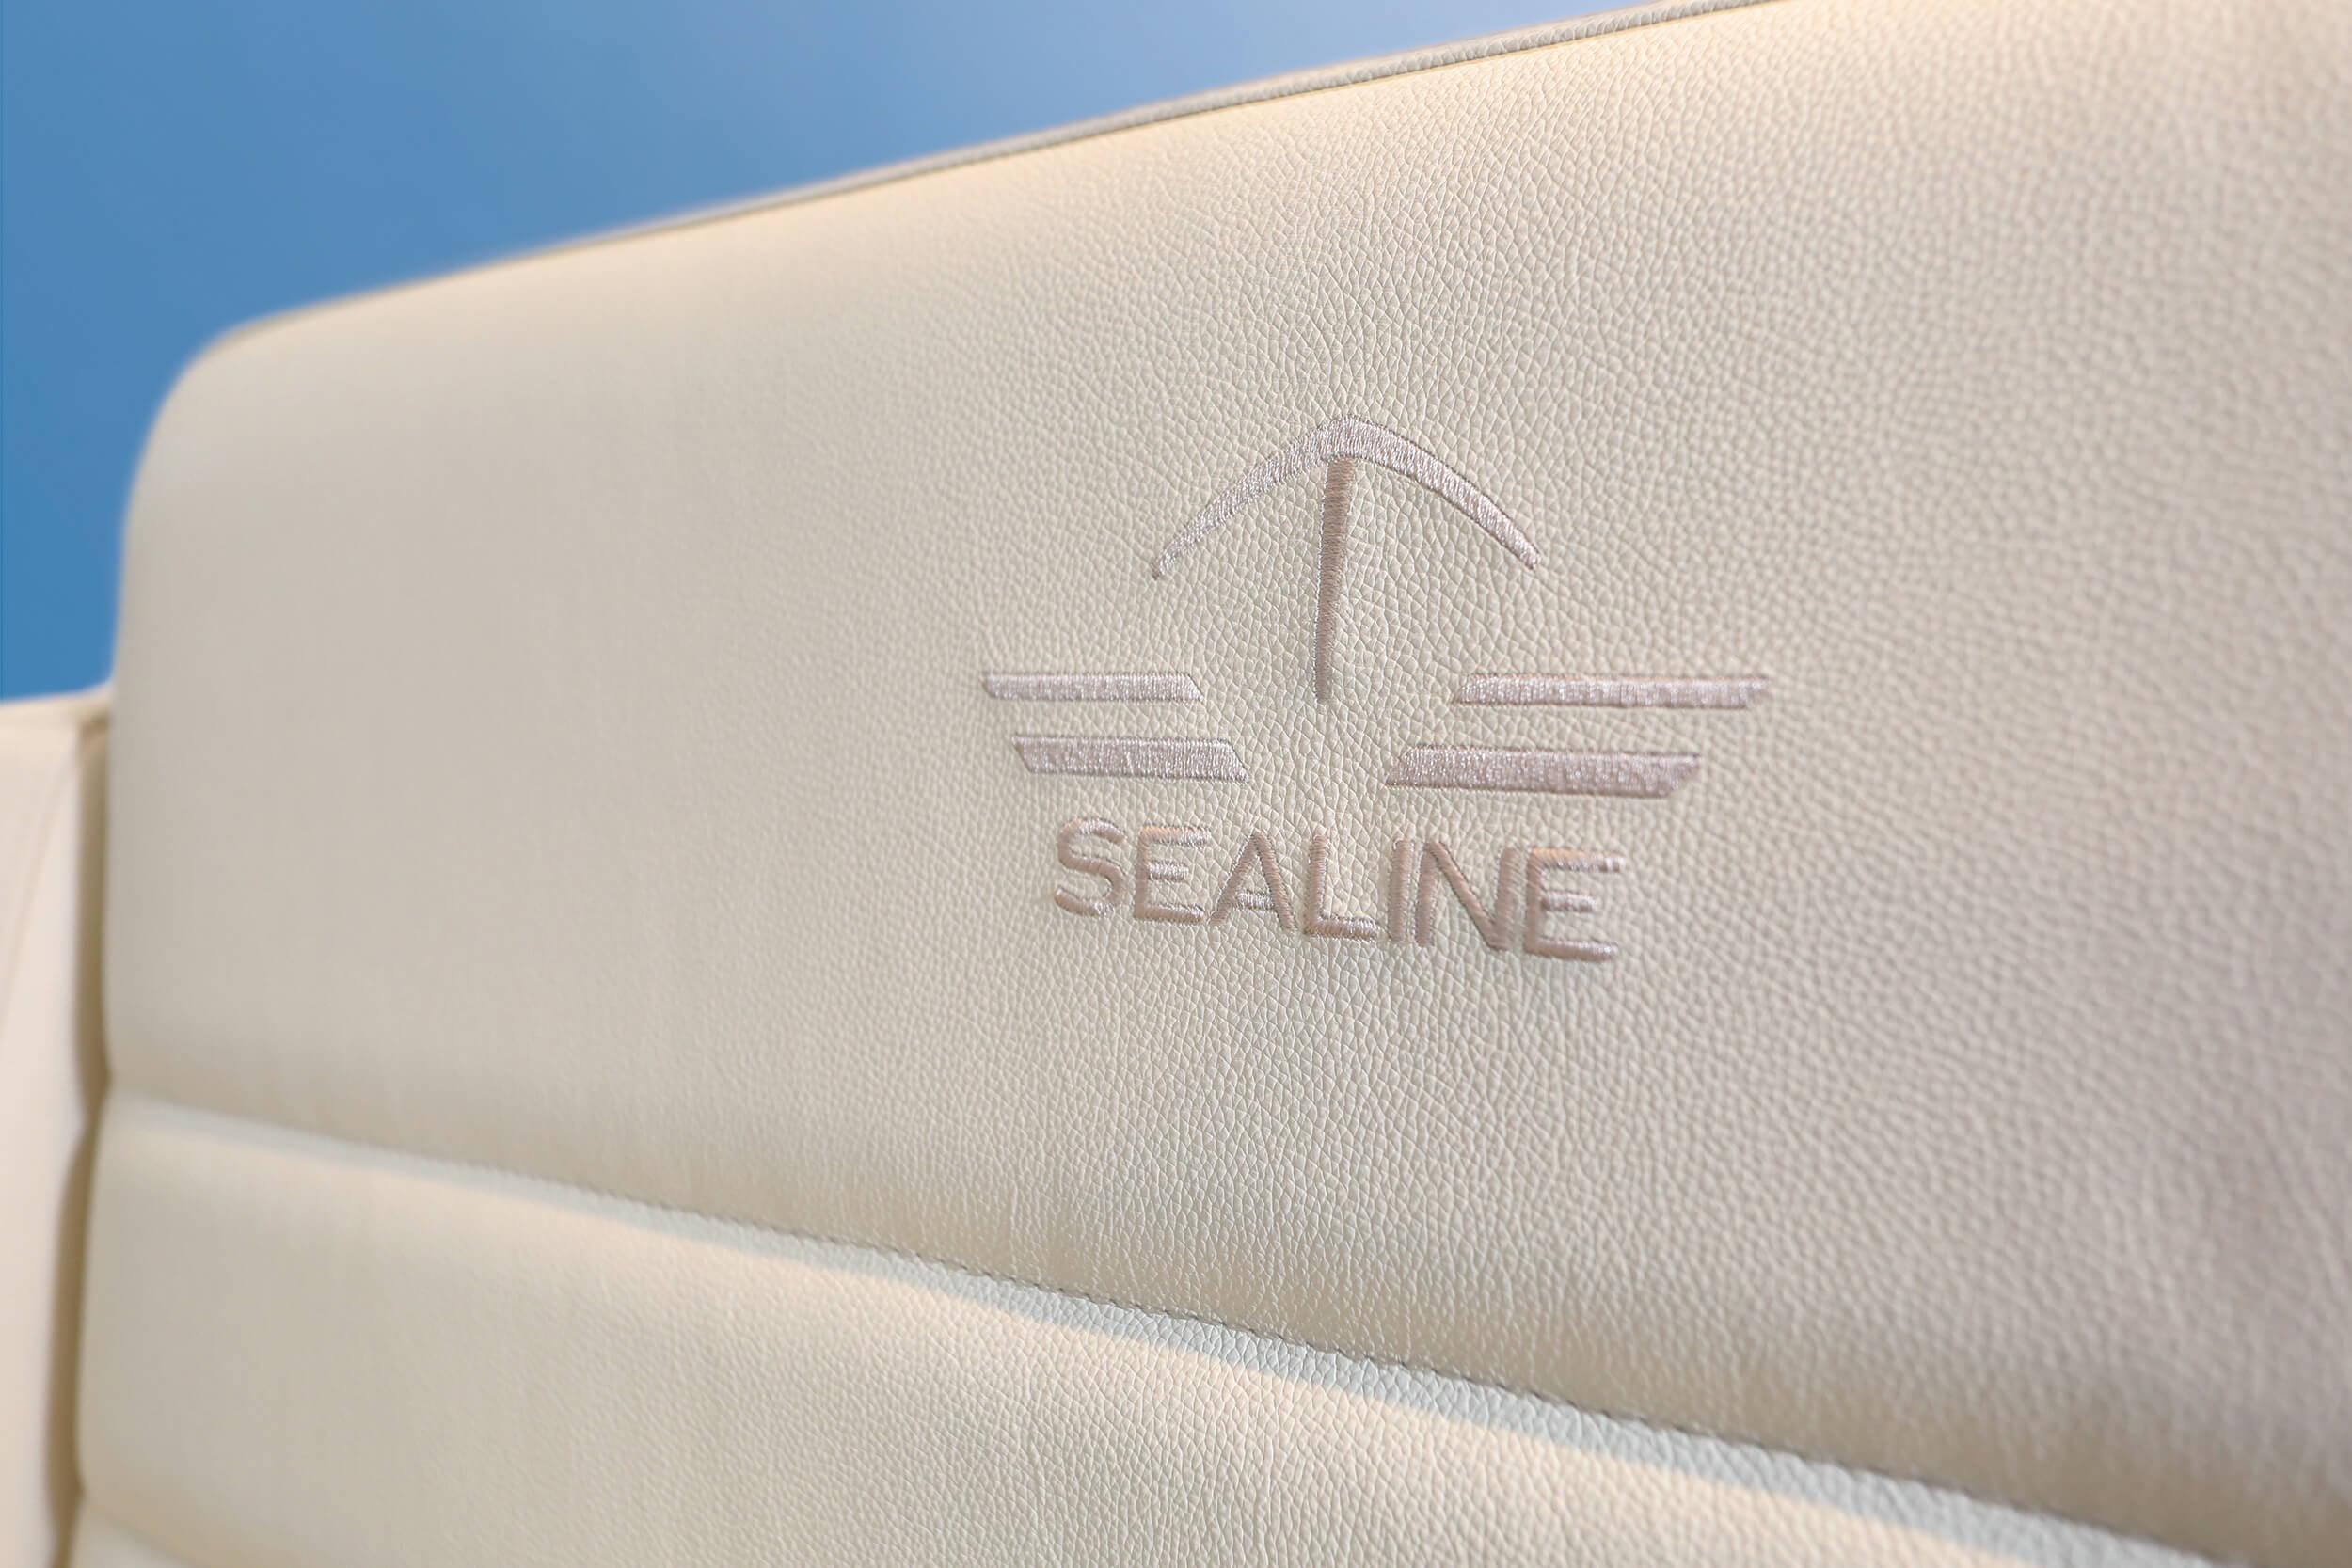 Sealine F430: Interior